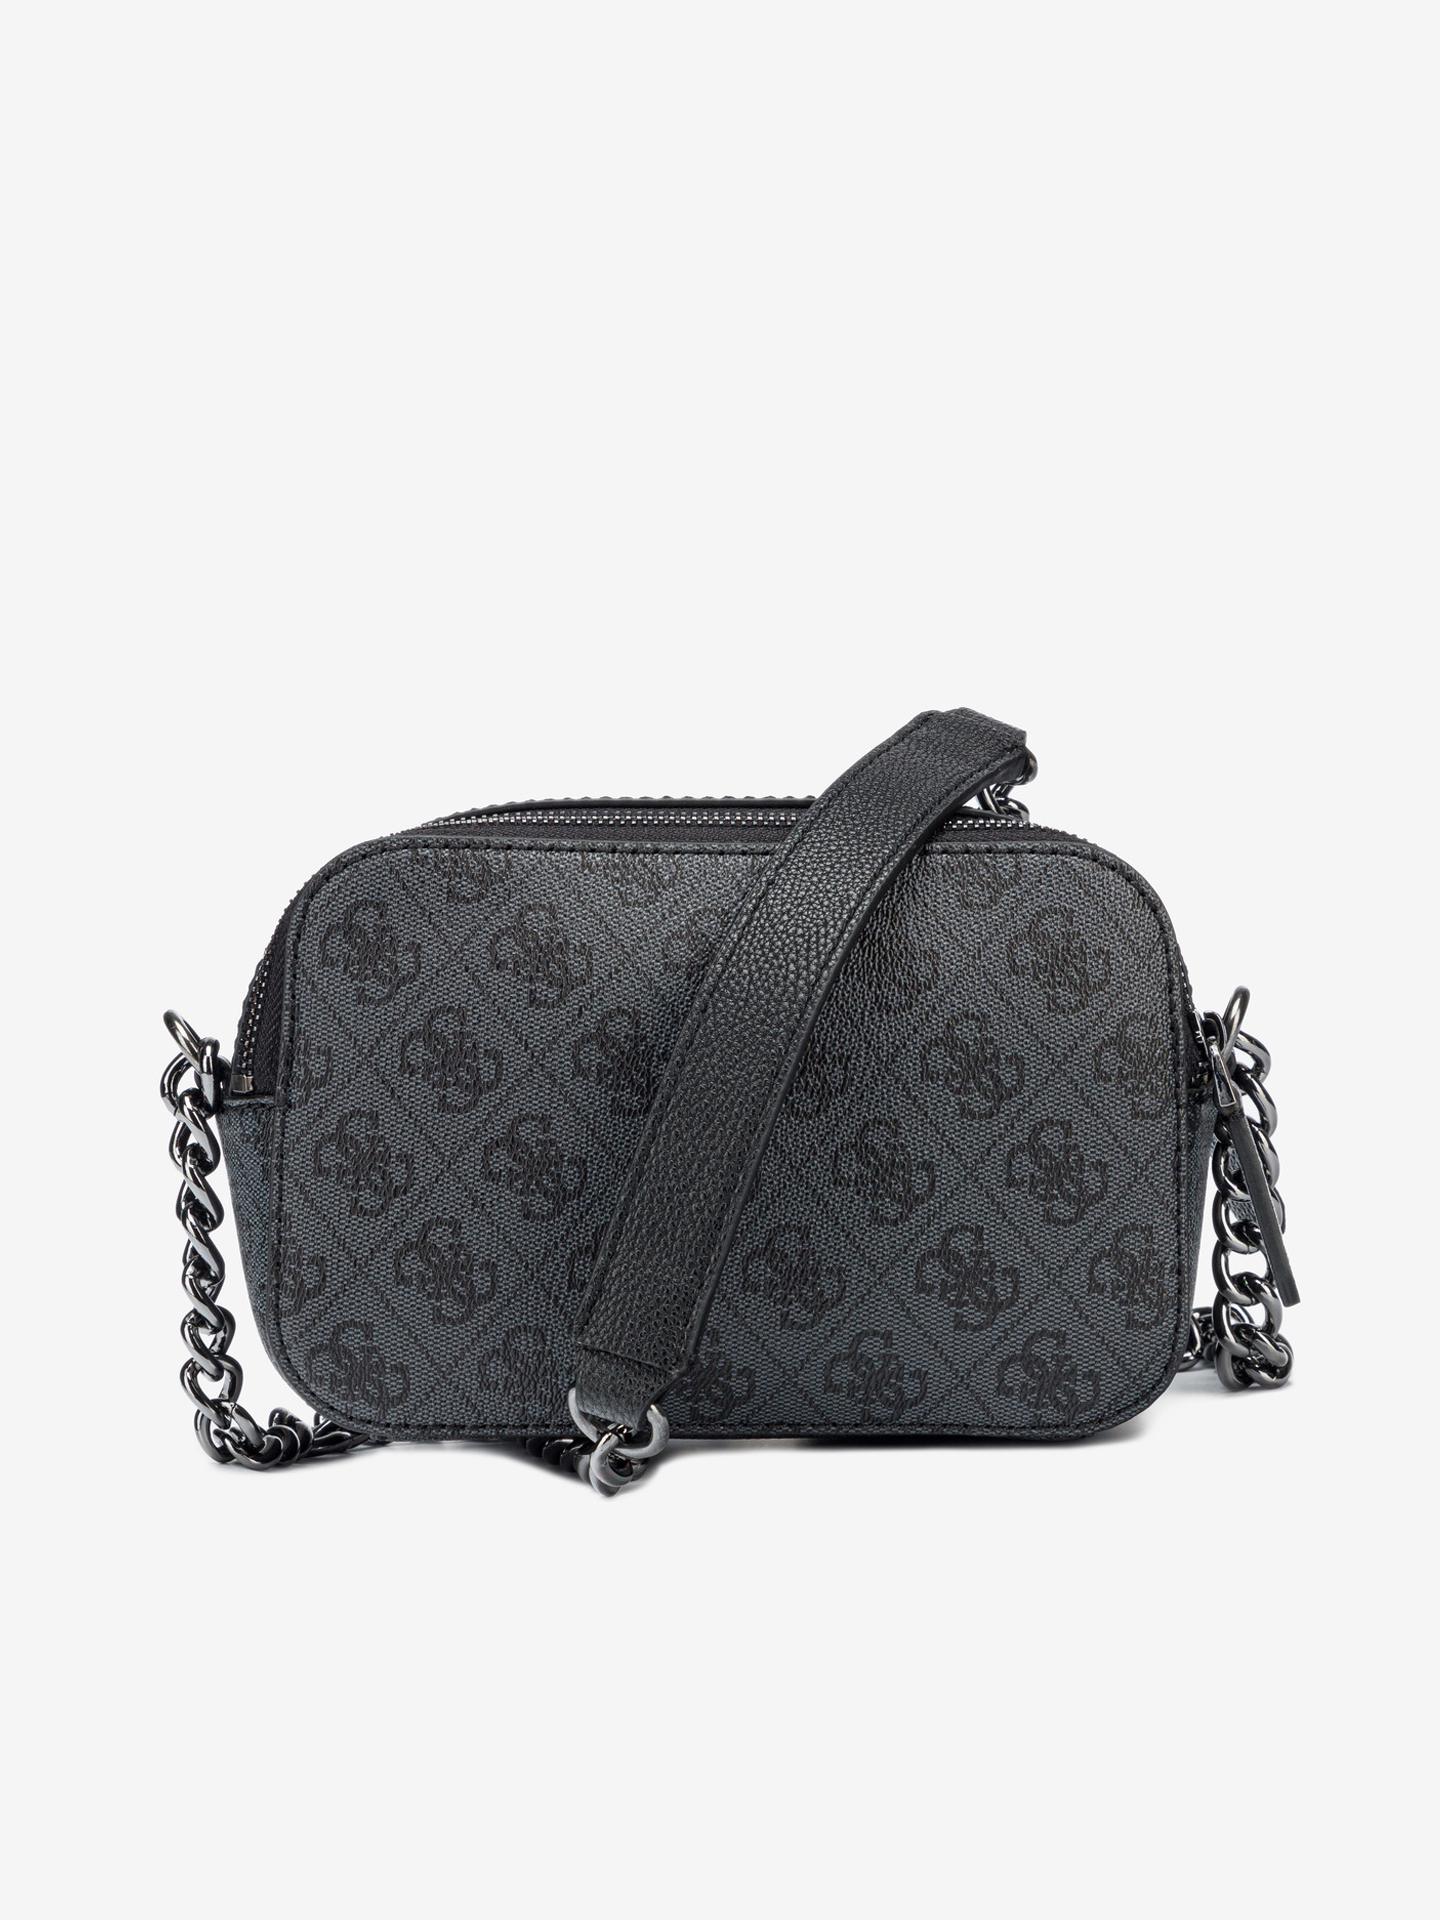 Guess grey crossbody handbag Noelle